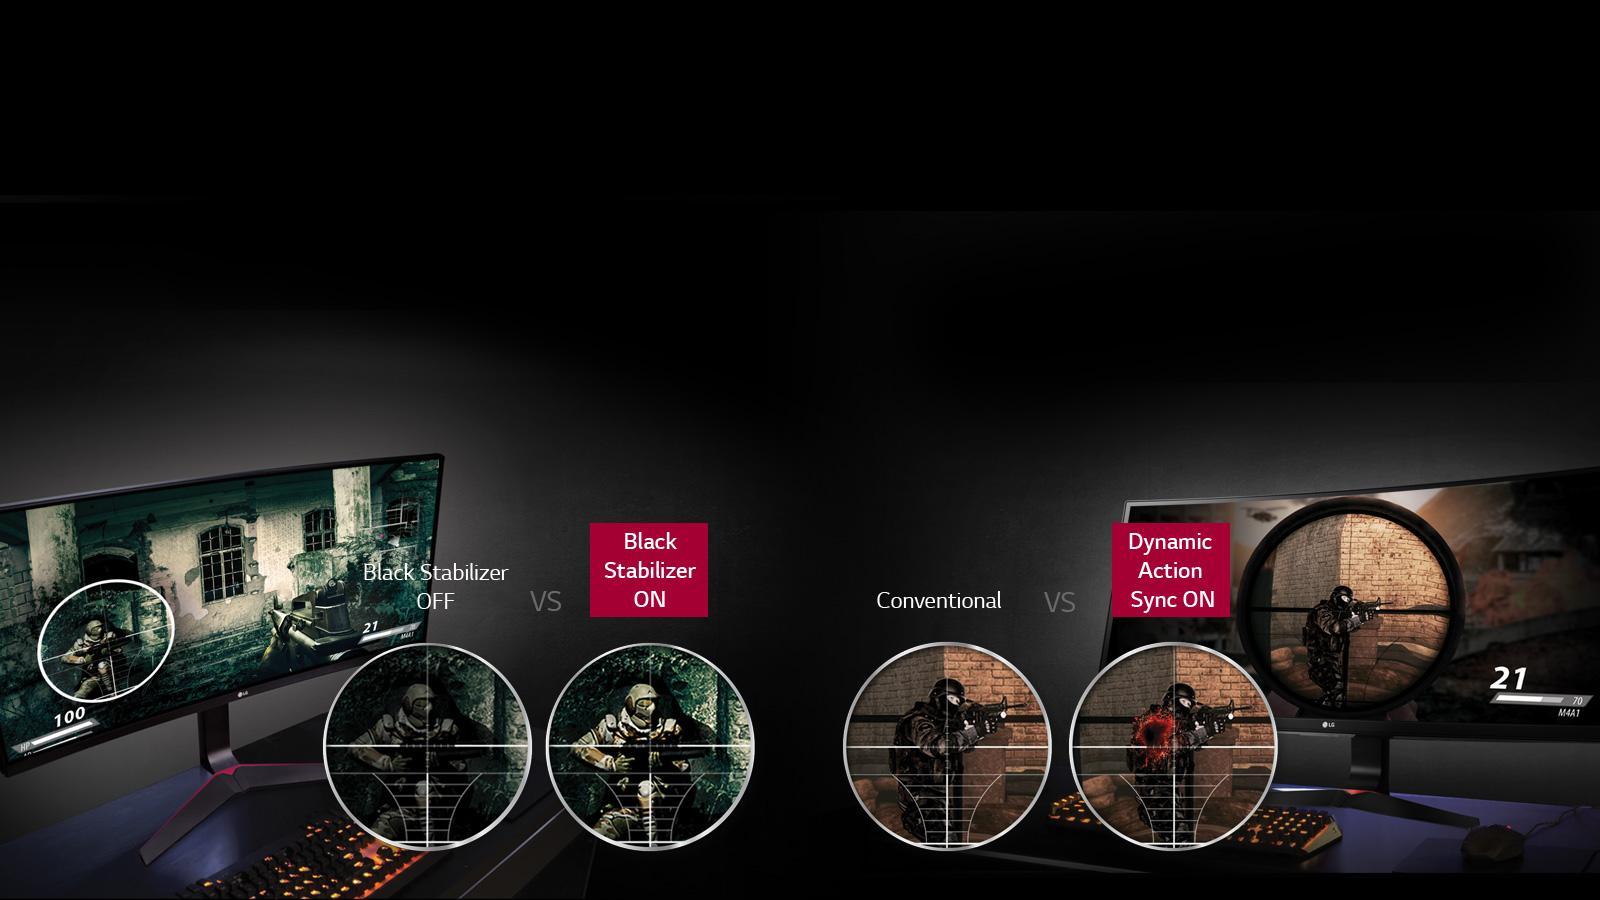 LG 34UC79G-B 34 Inch 21:9 UltraGear™ Full HD IPS Curved Gaming Monitor